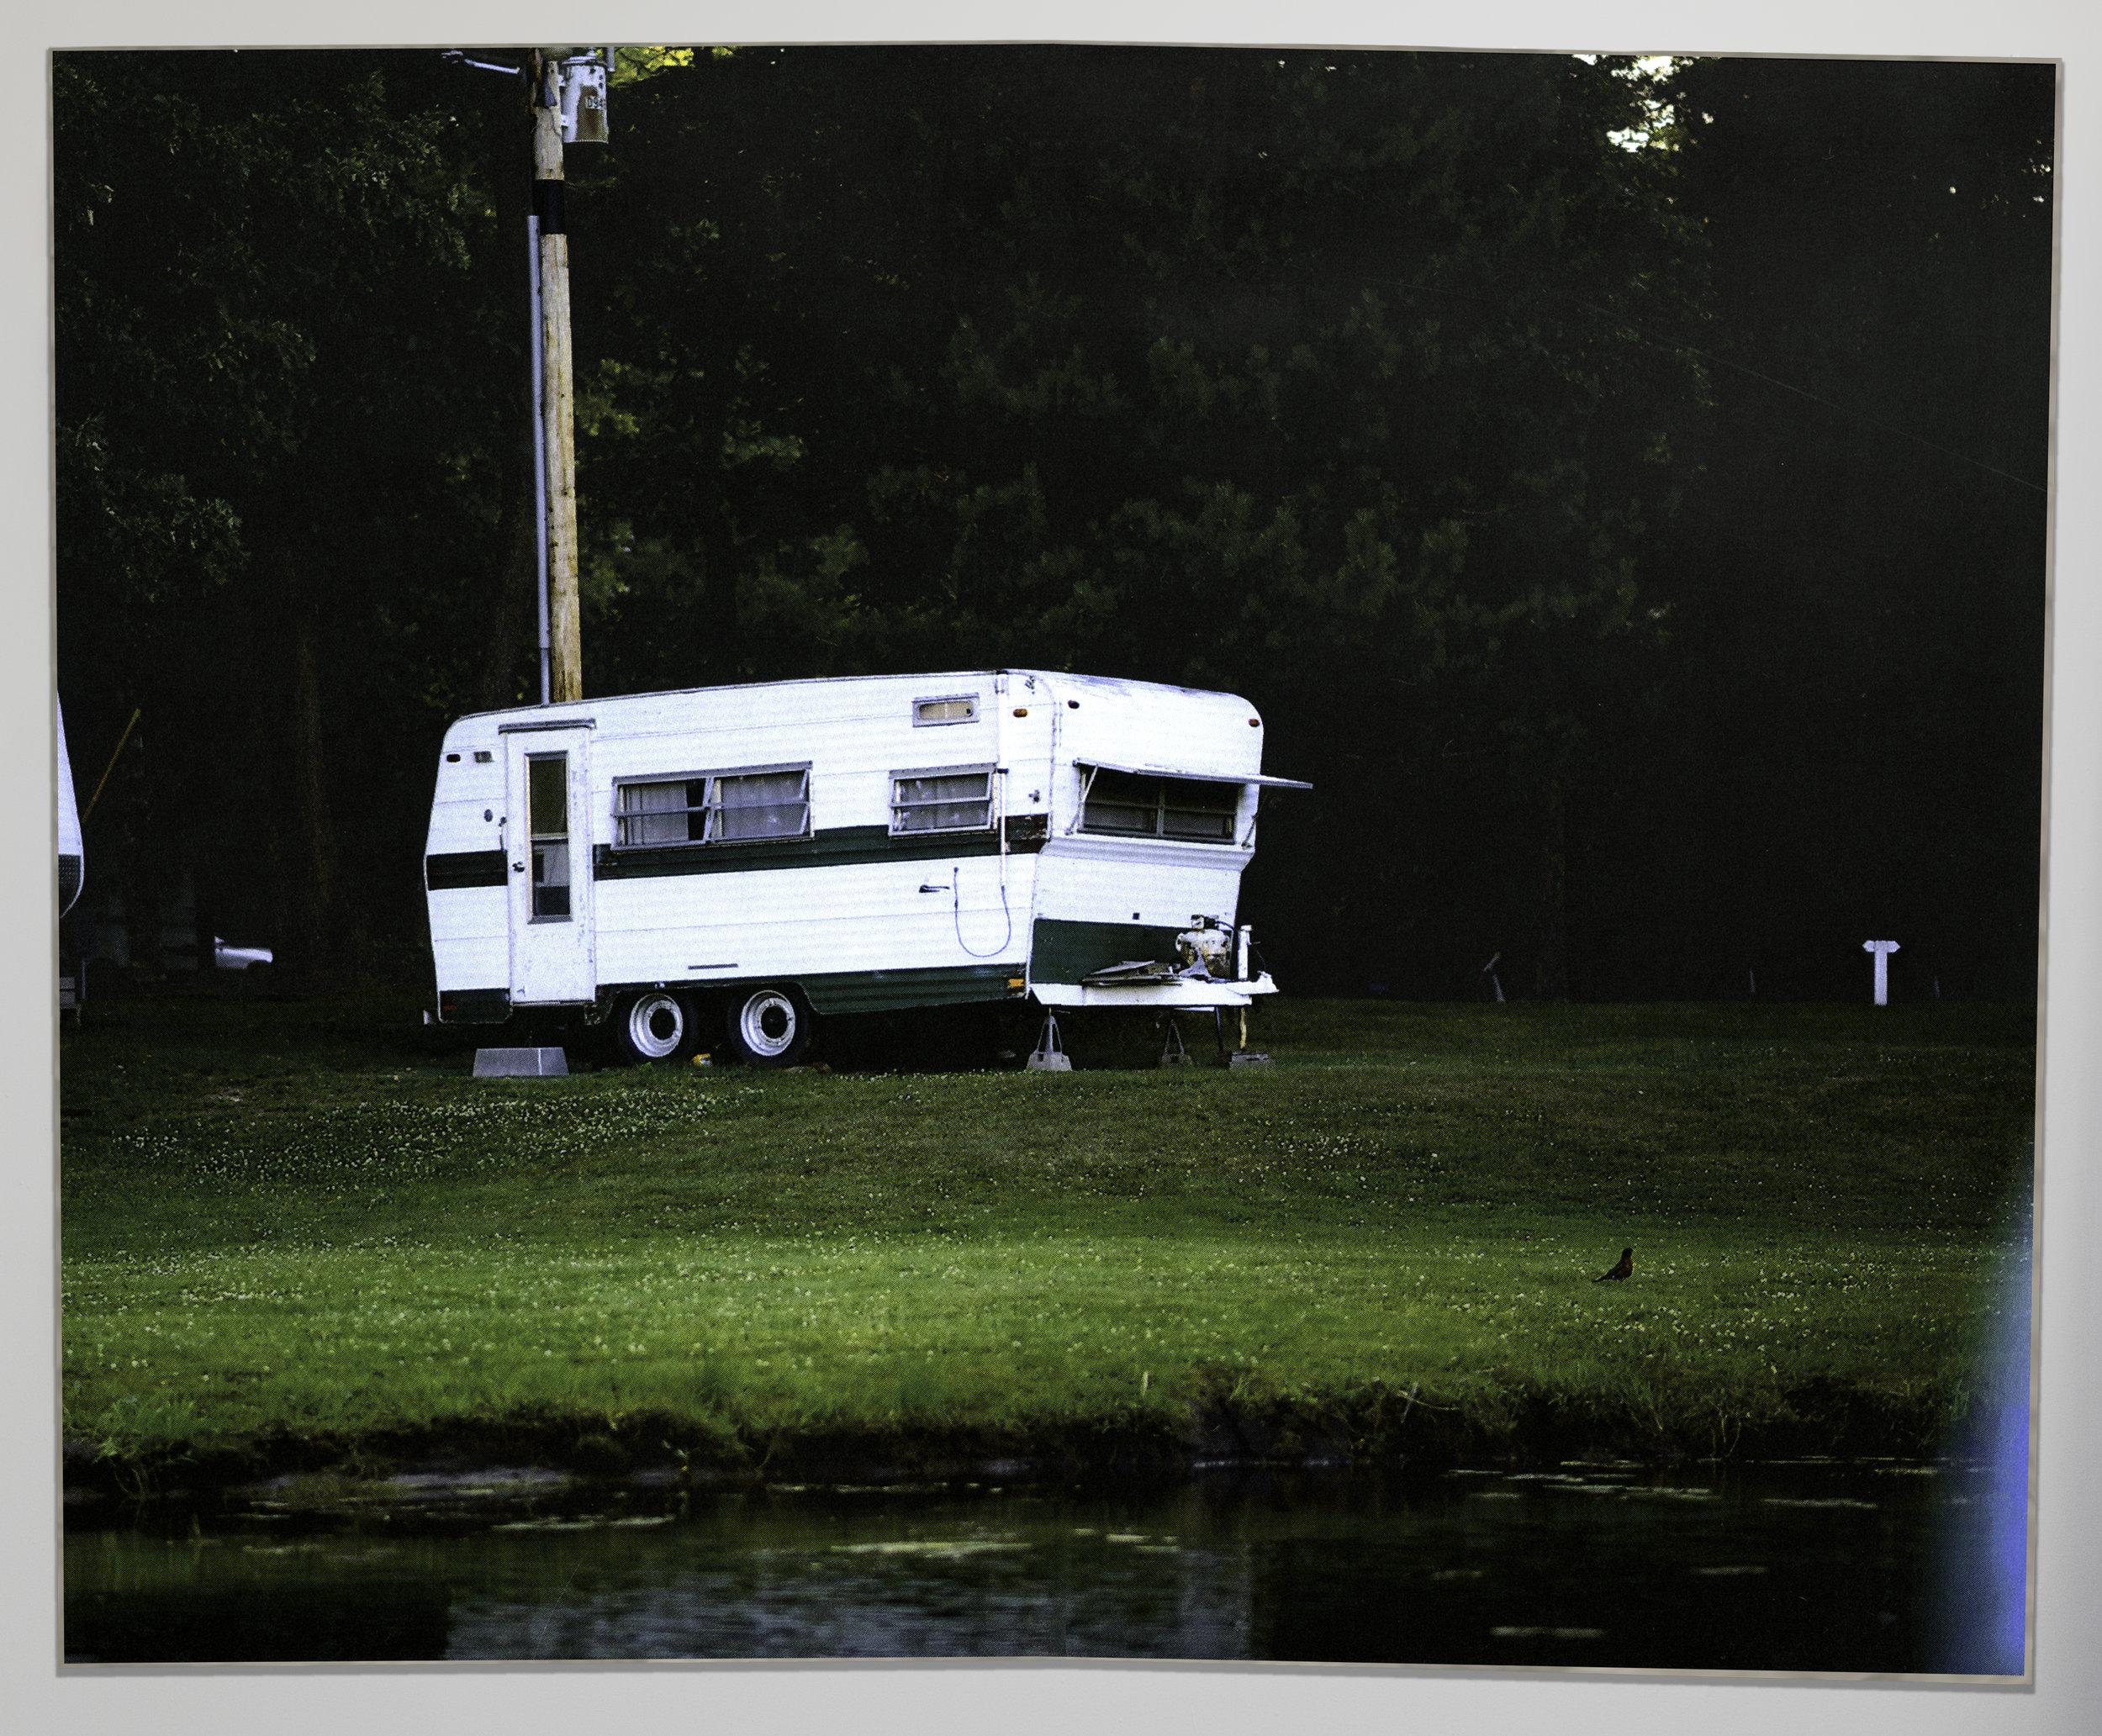 trailer_cropped.jpg